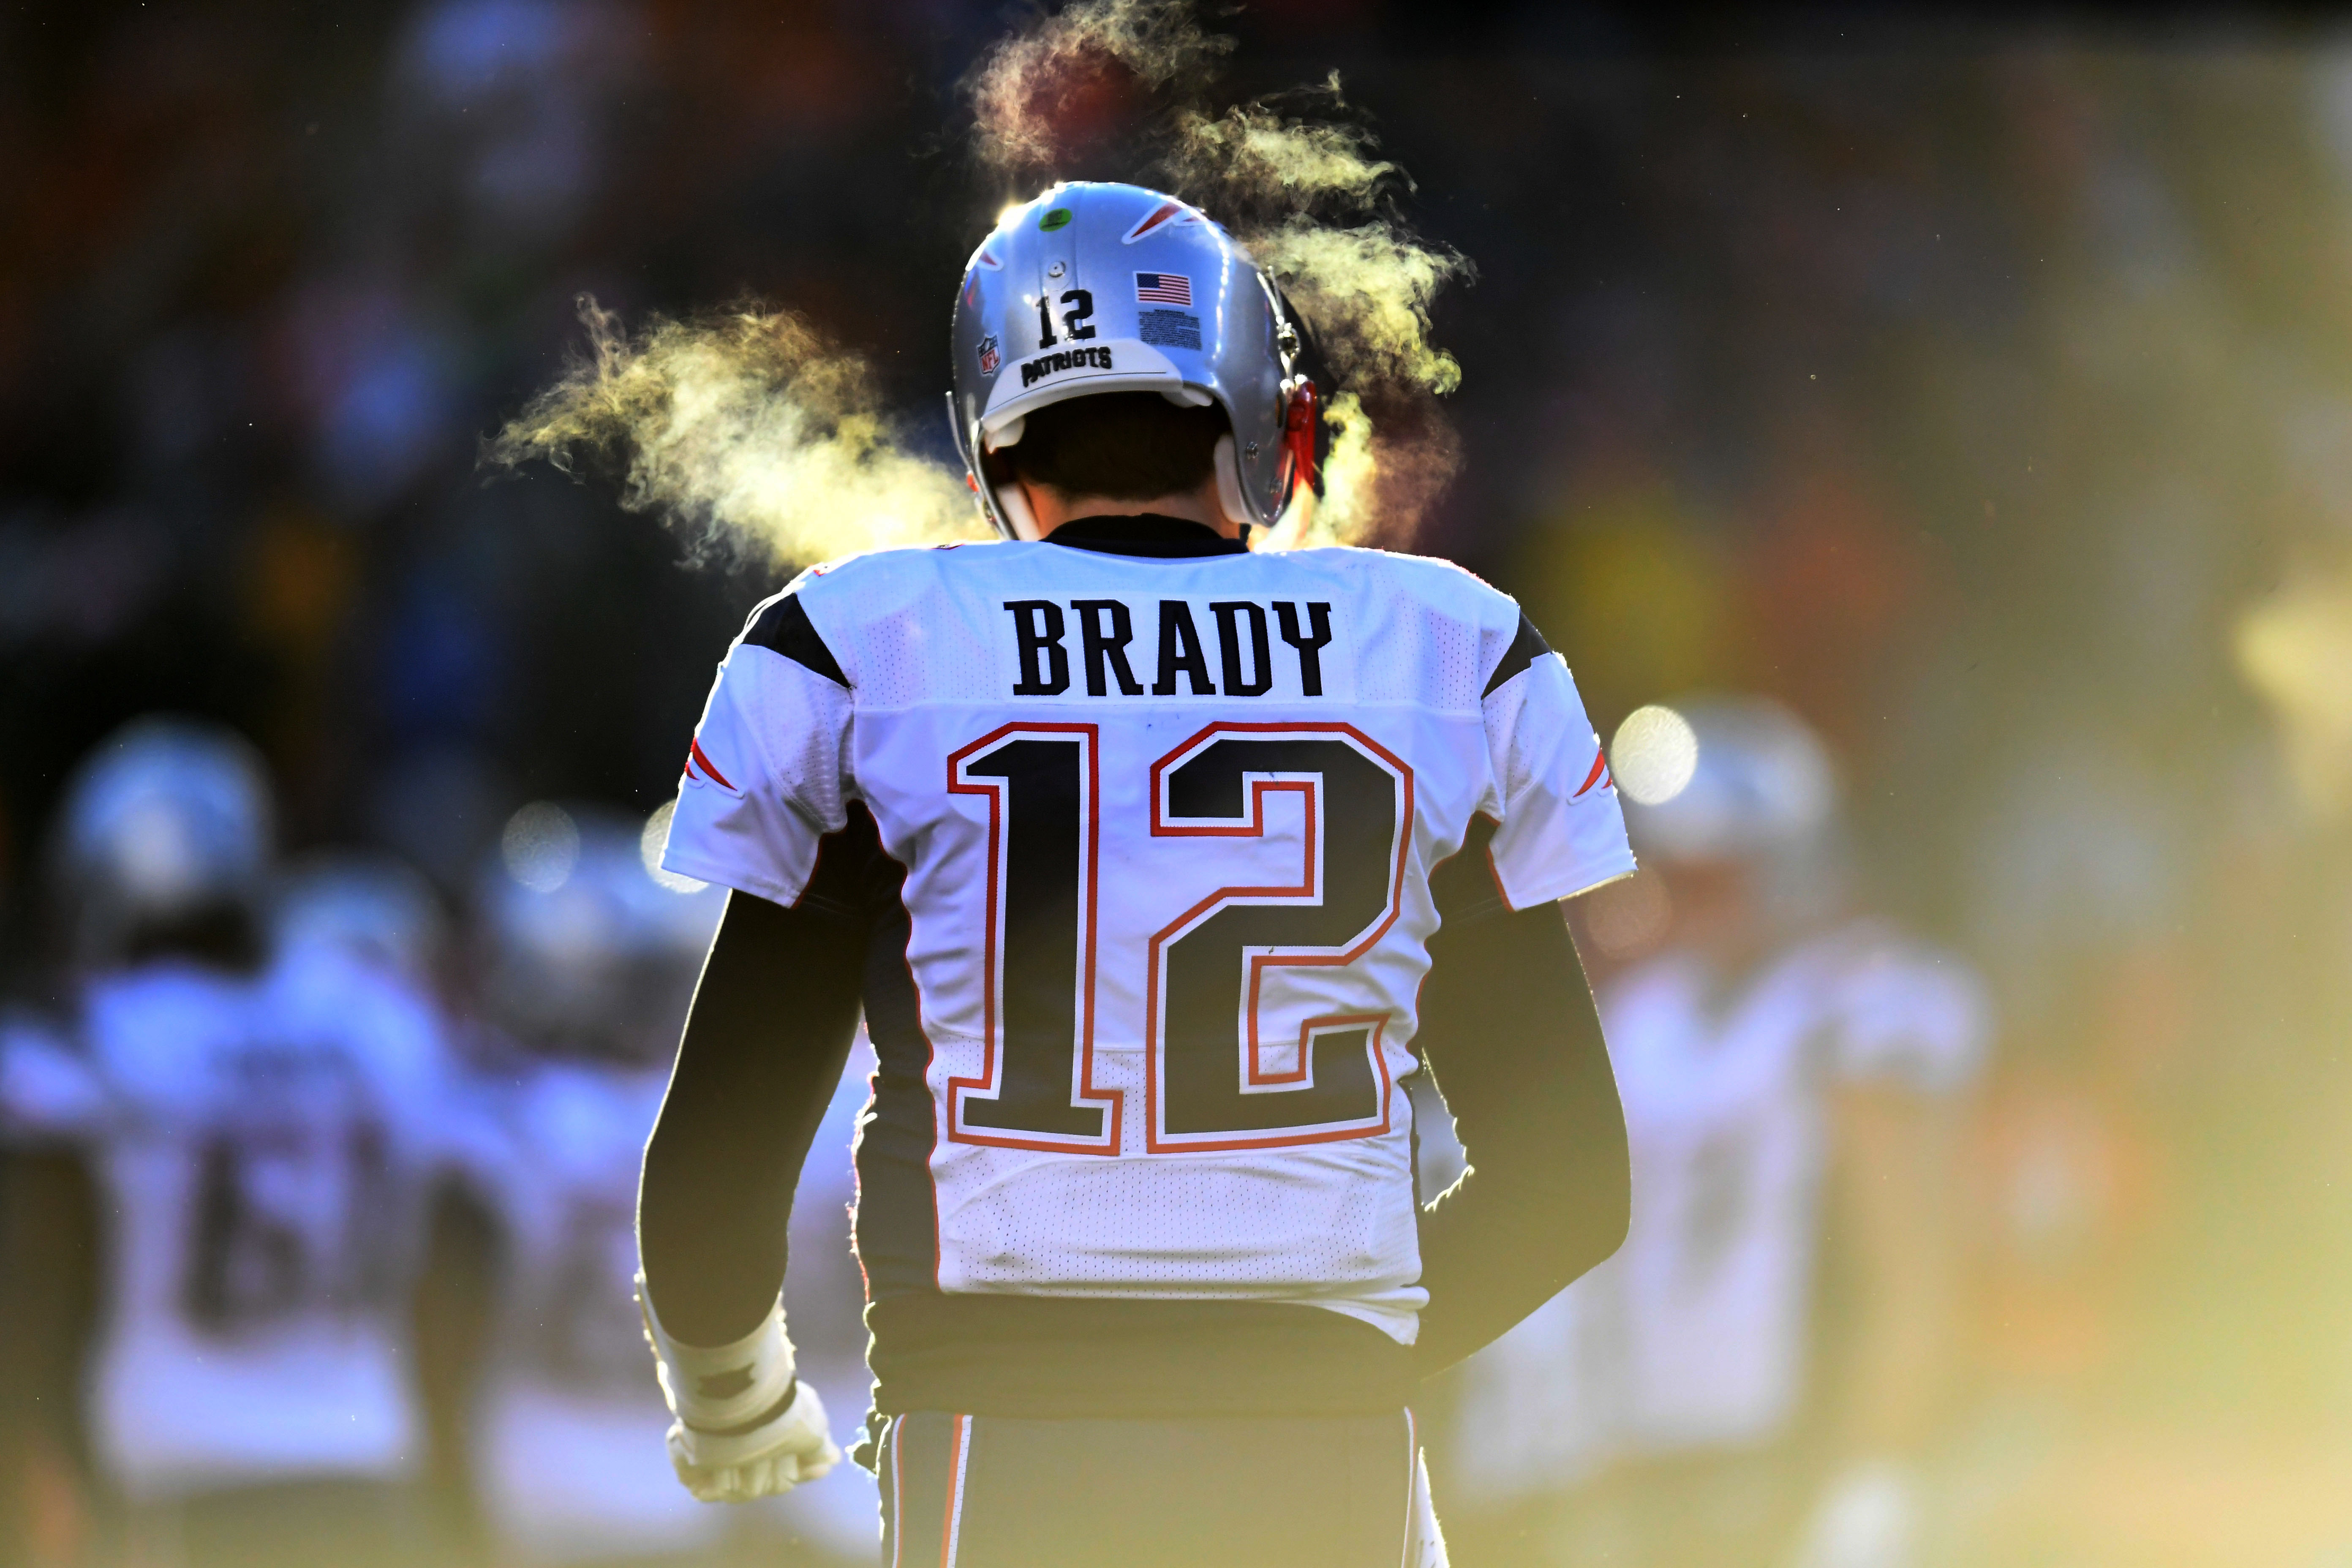 Tom Brady Back And Number 5568x3712 Wallpaper Teahub Io